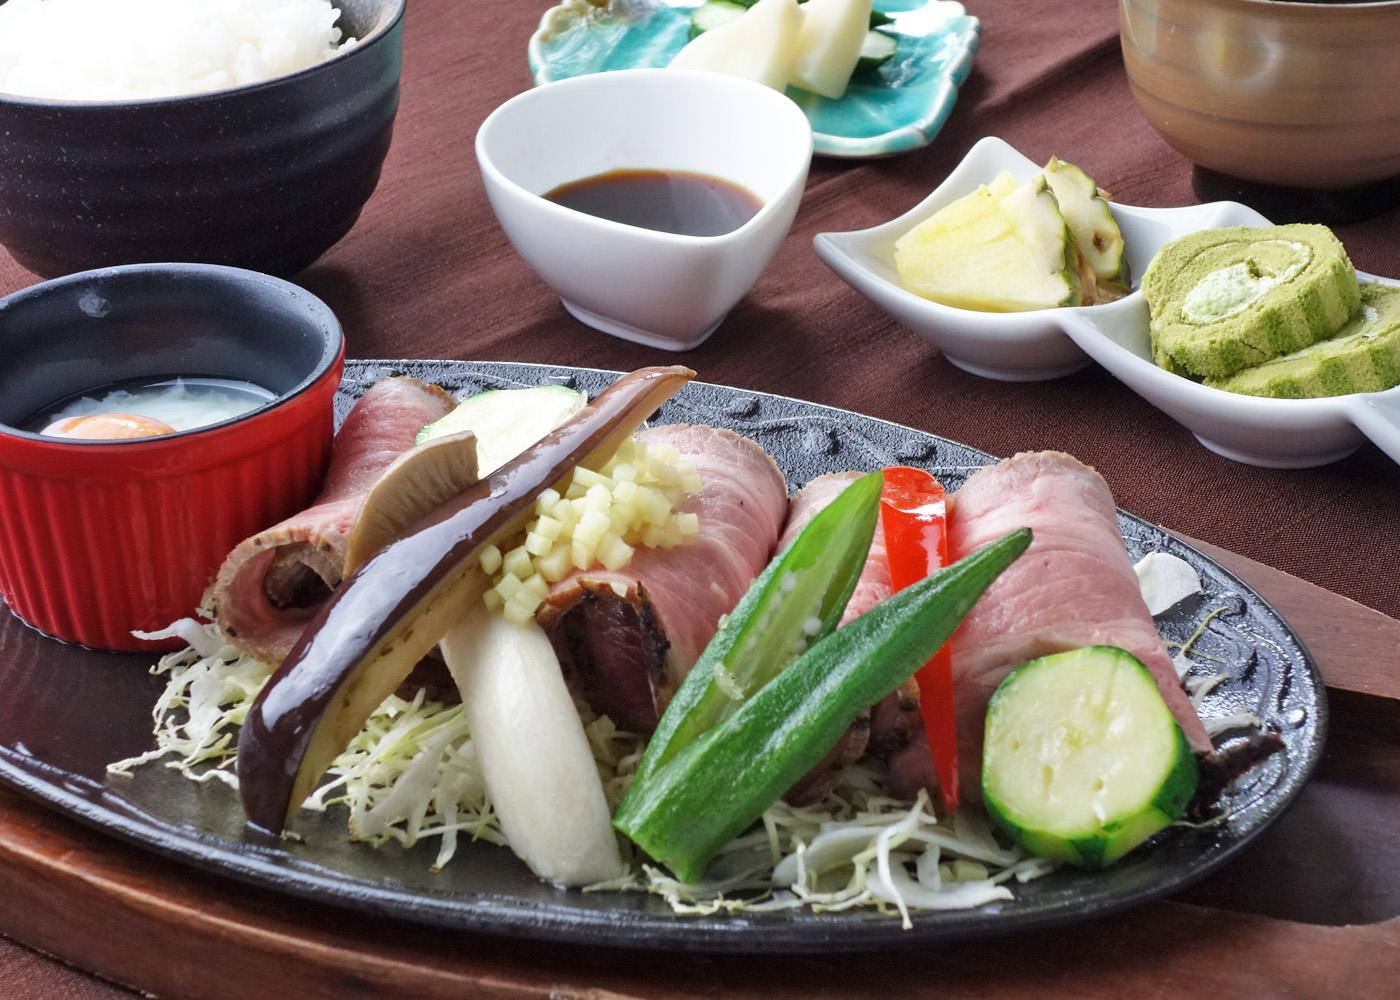 低温調理の四元豚生姜焼き 1,500円(税別)